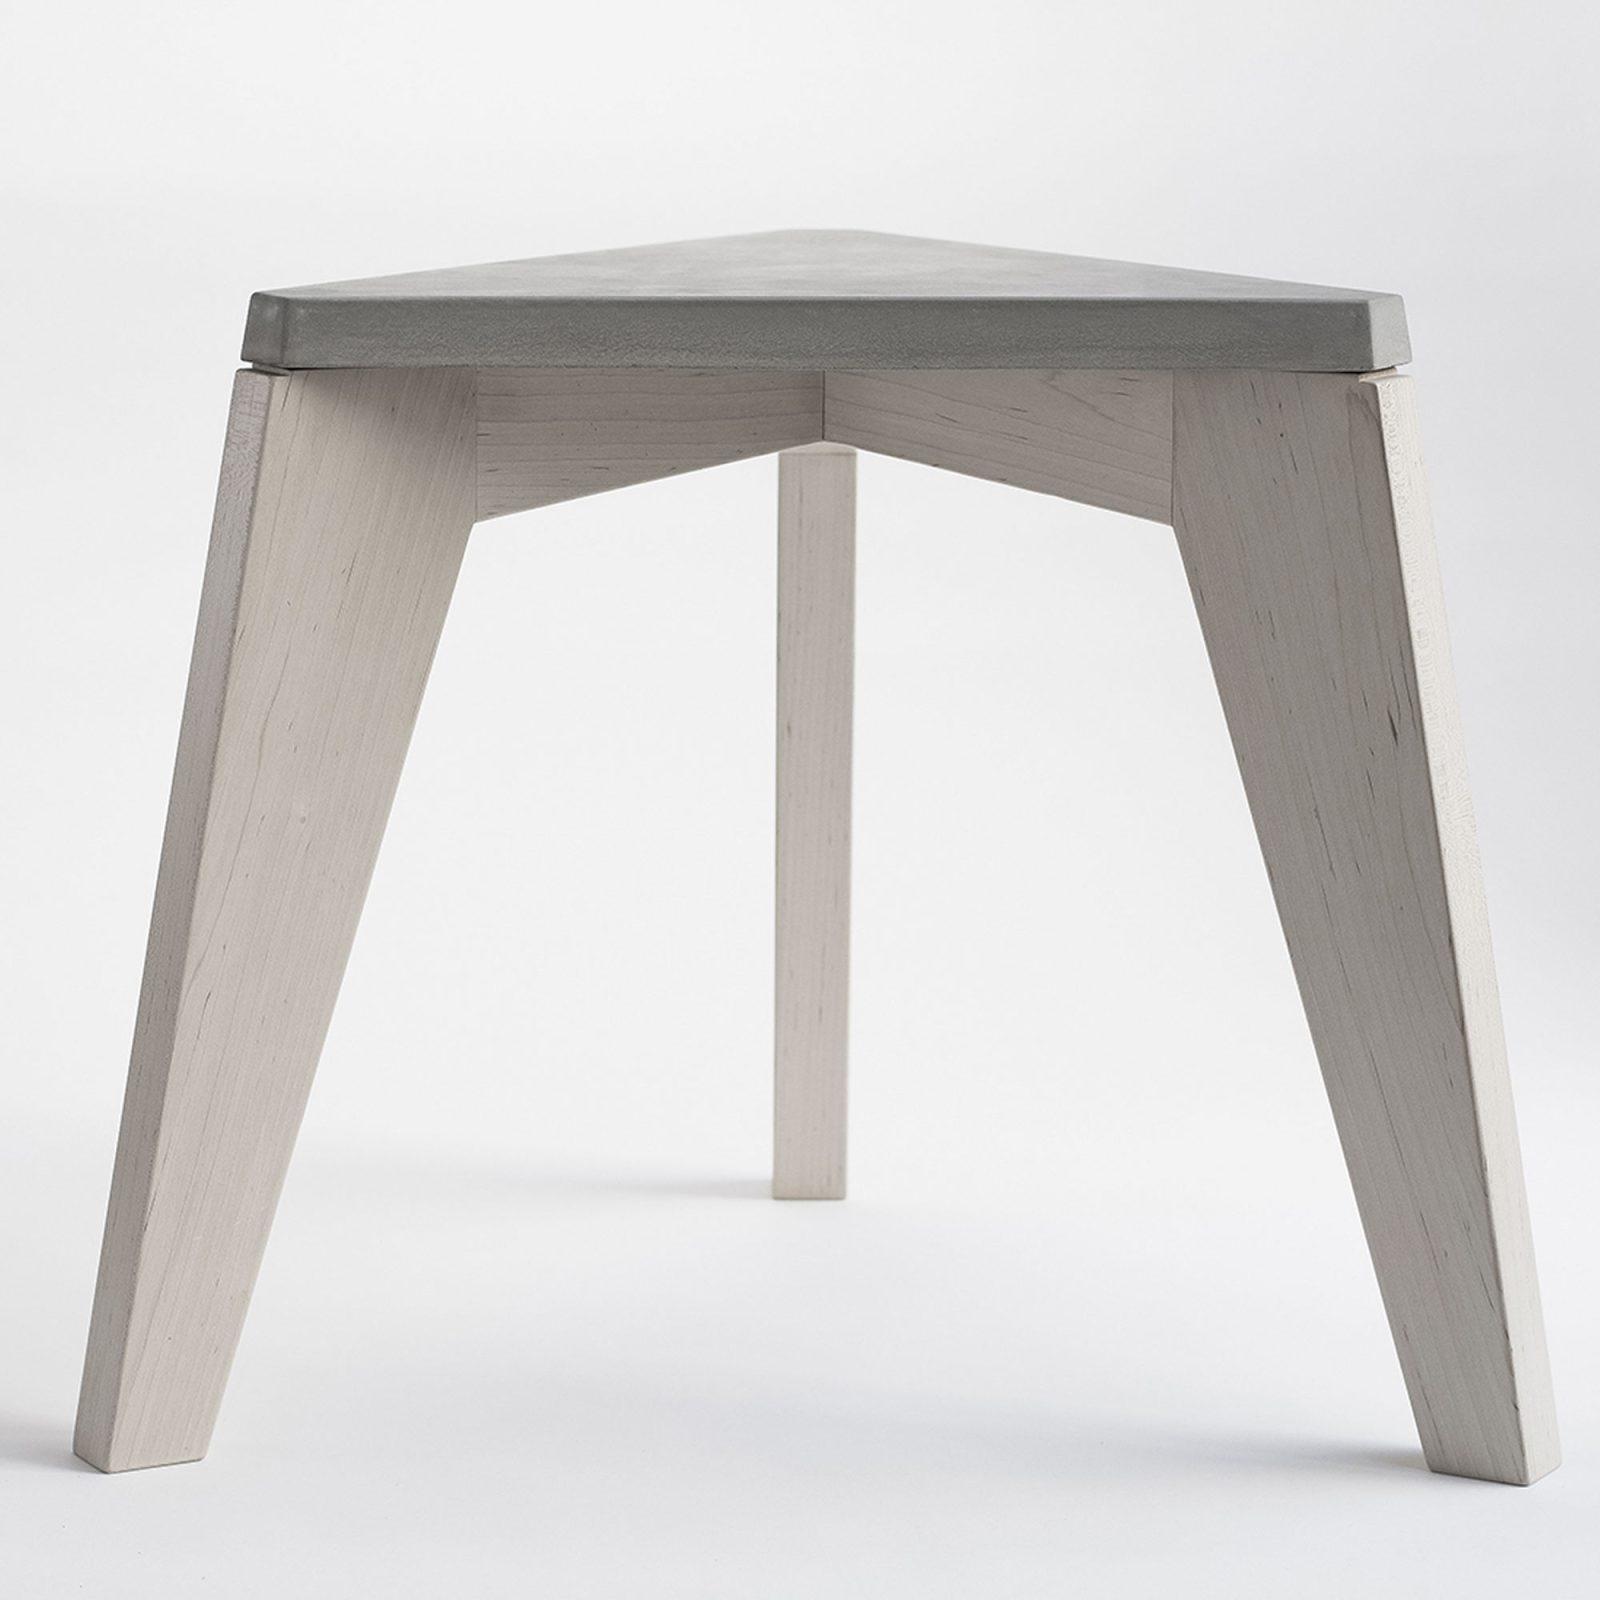 white-oak-and-concrete-stool-3